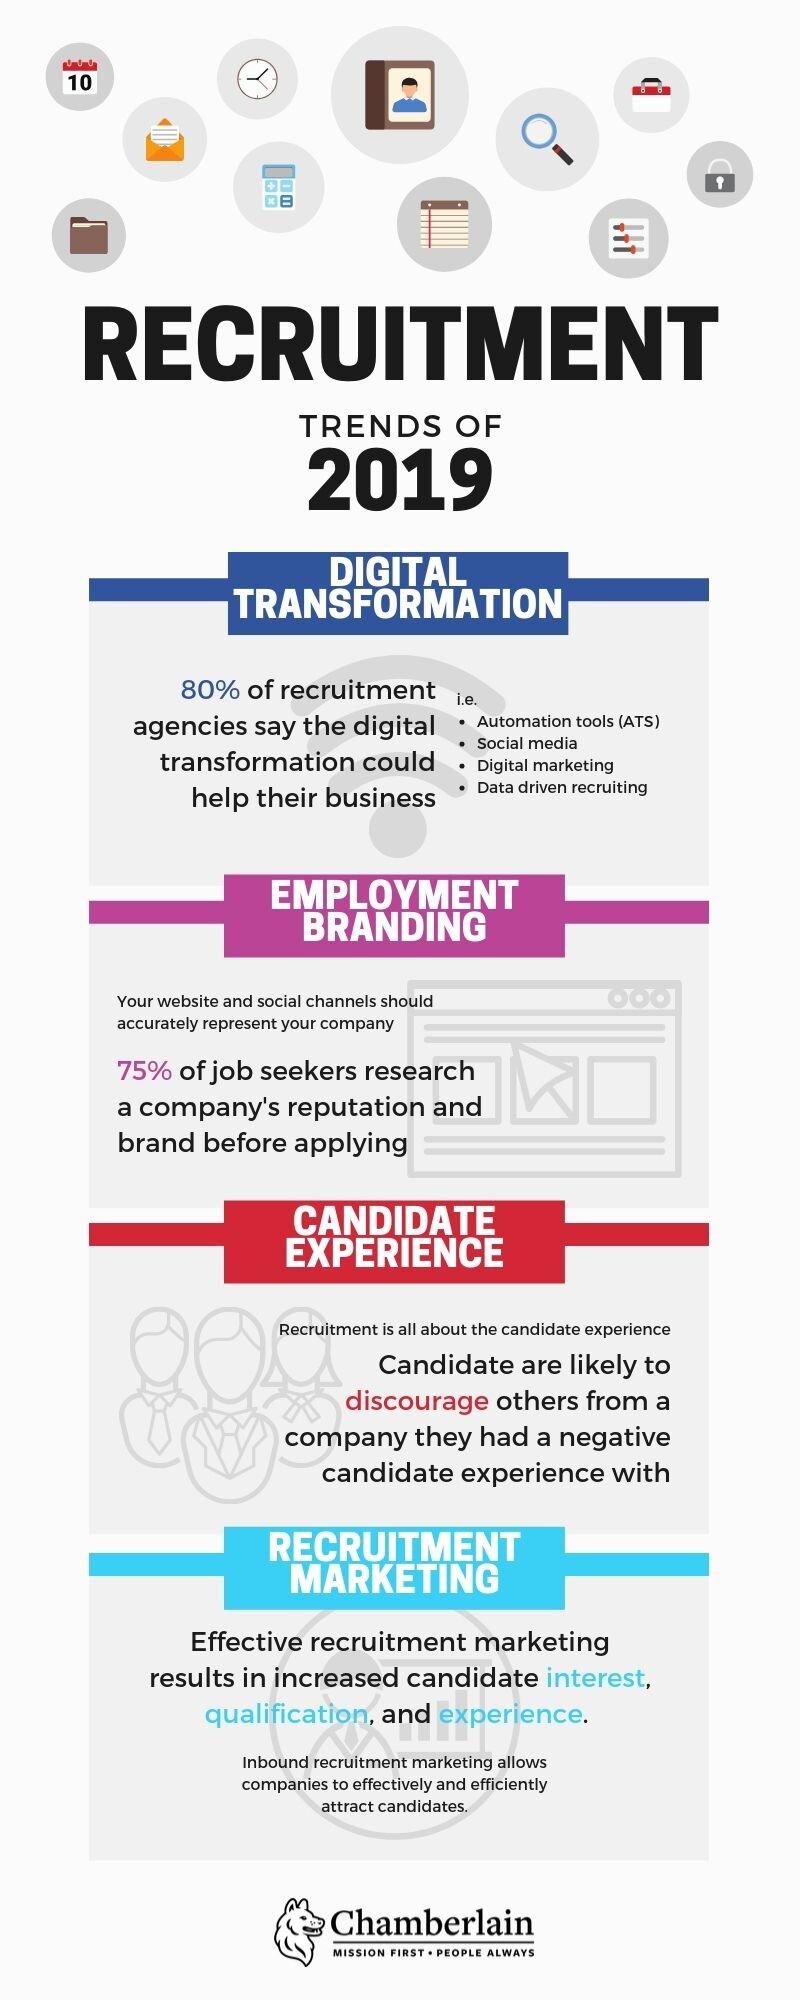 Recruitment Trends of 2019